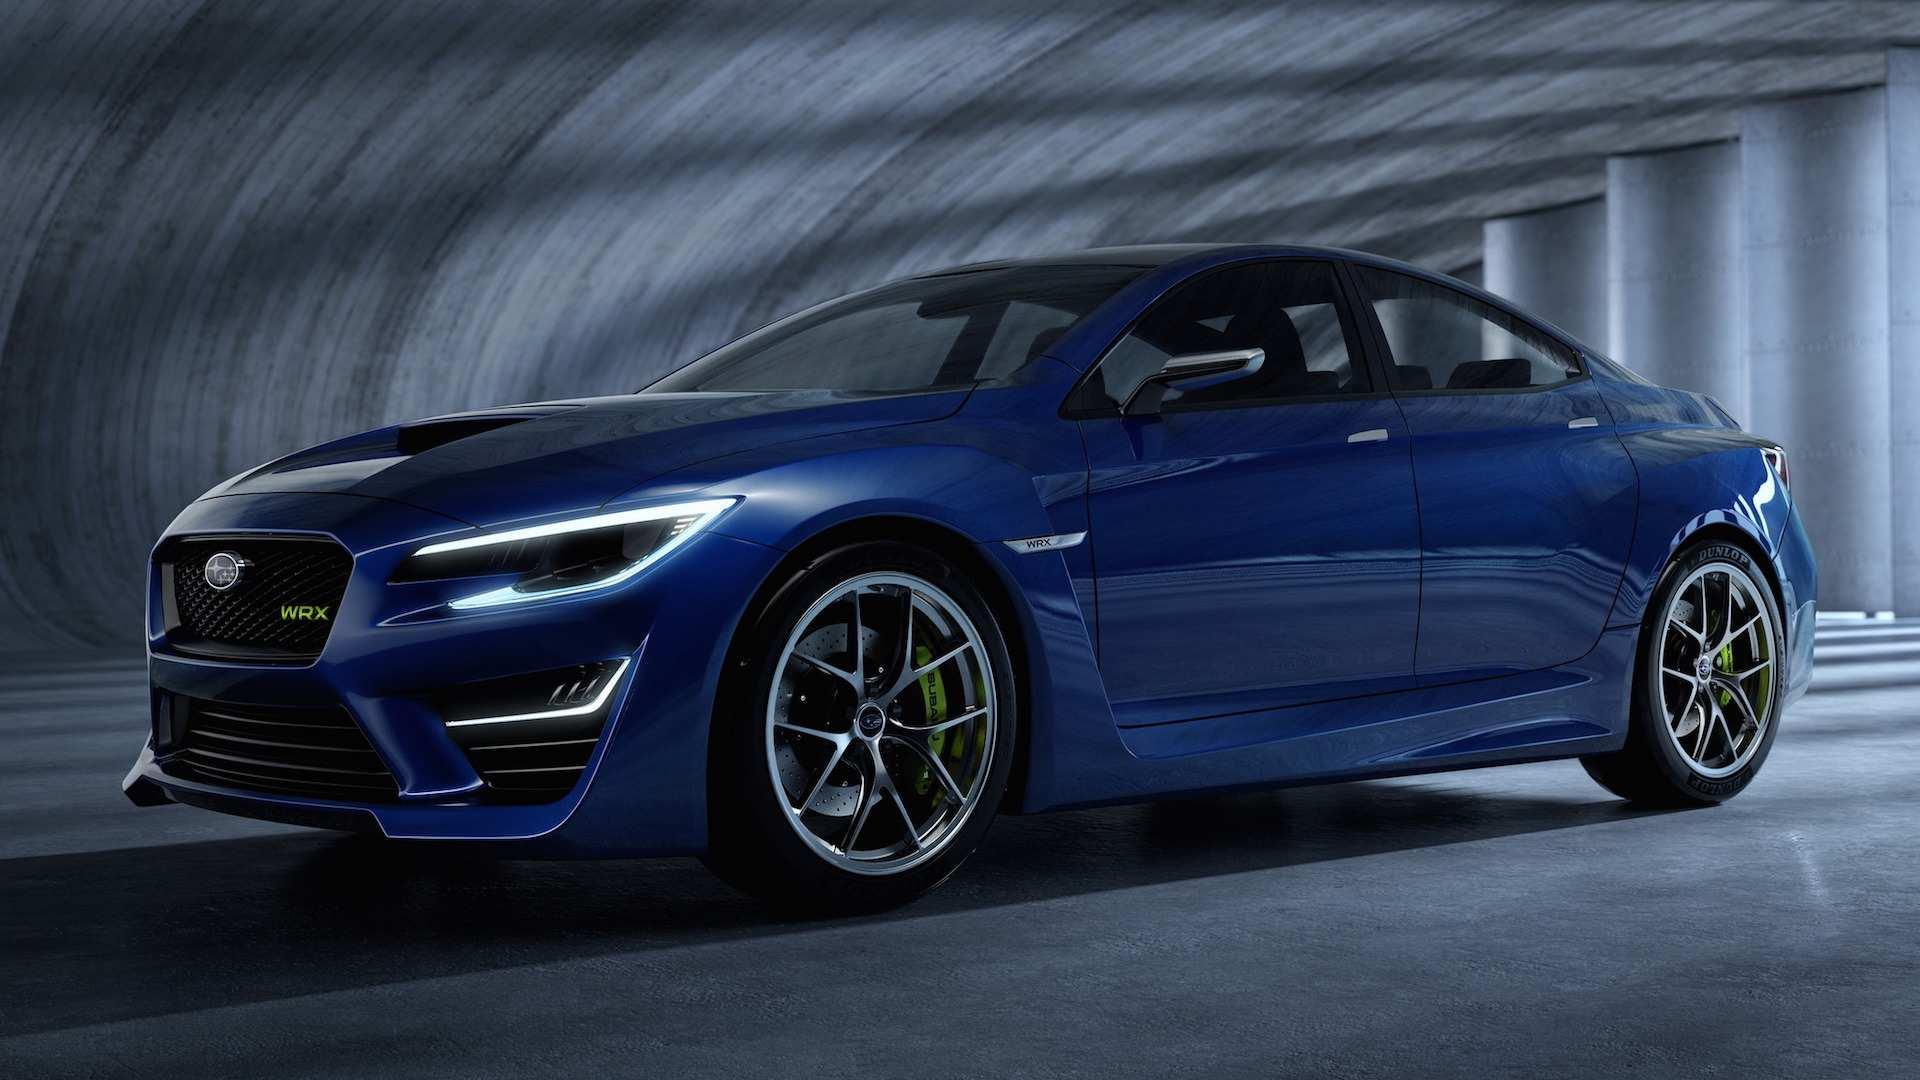 92 All New Subaru Sti 2020 Concept Spy Shoot with Subaru Sti 2020 Concept